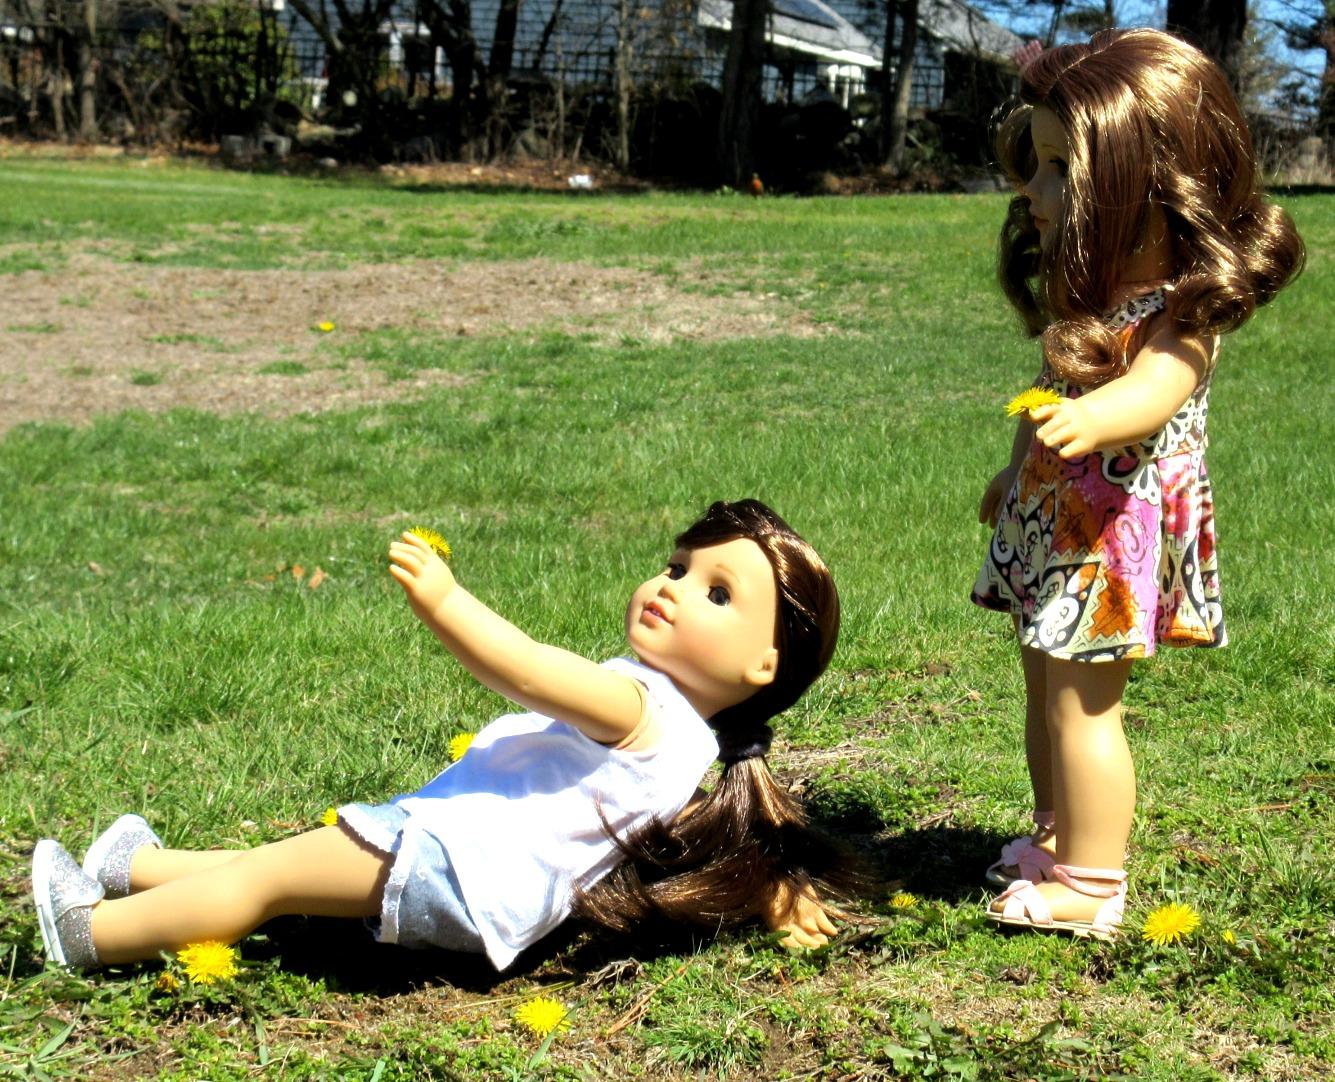 American girl doll summer dandylions .jpg